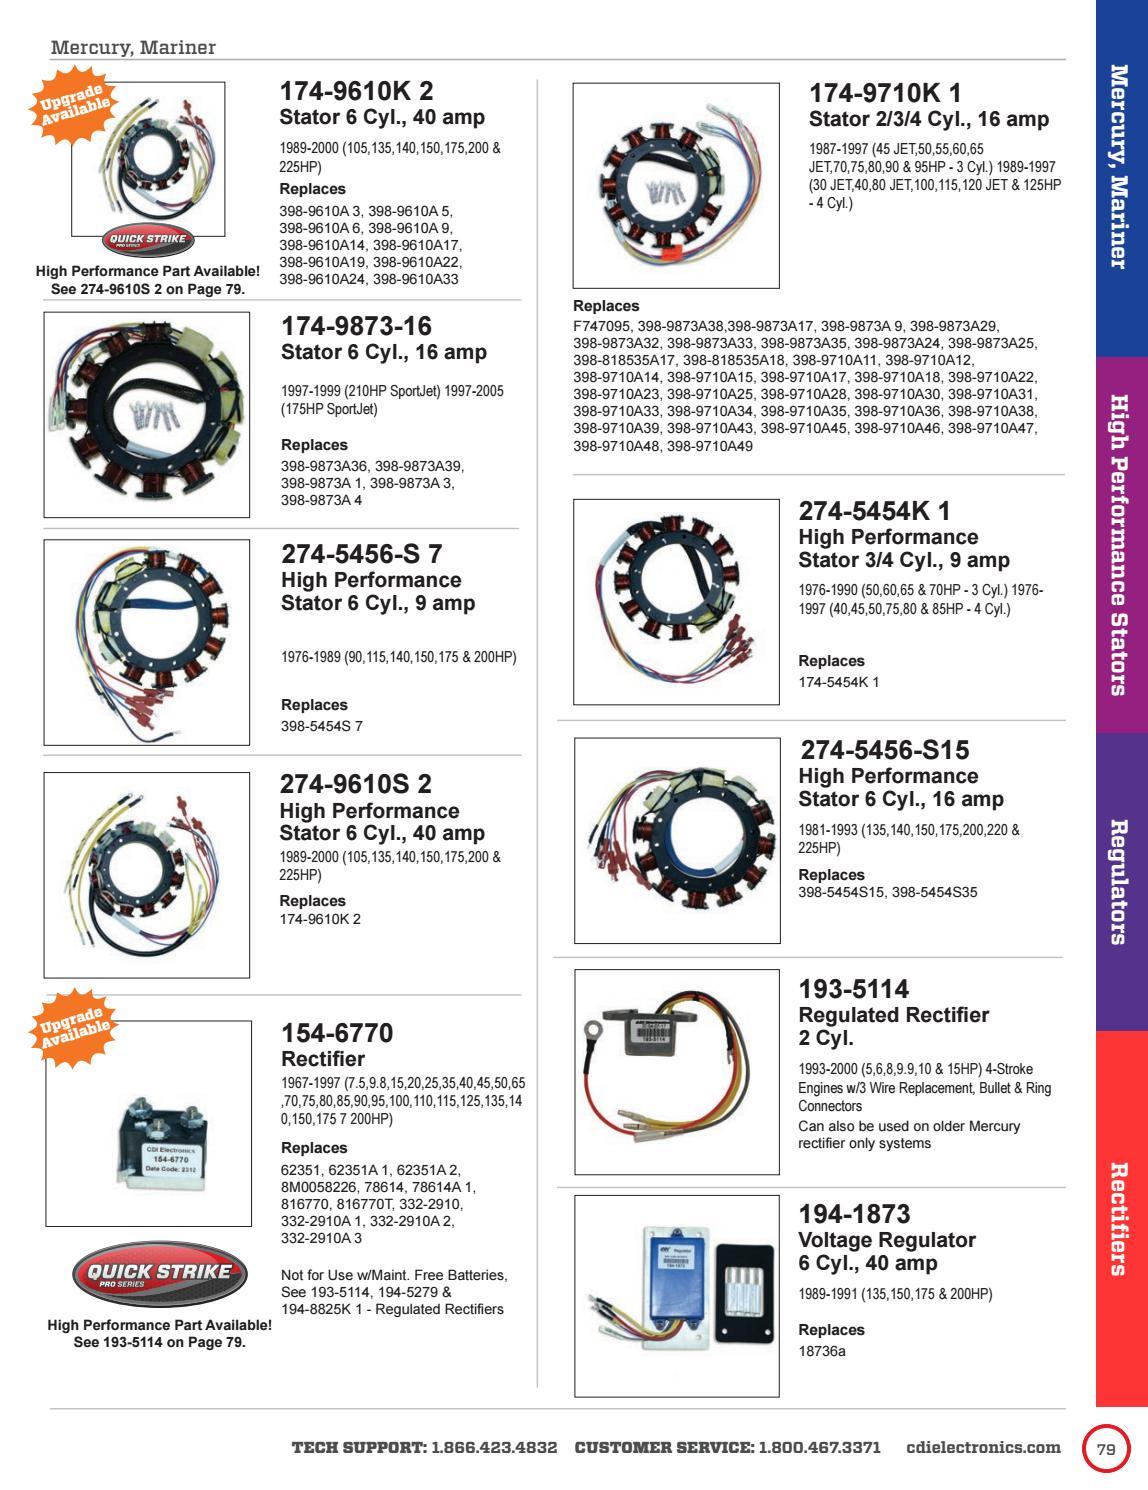 Magnatec BTX18-400 RS 265-651 tiristore 500V 1A 30mA 3-Pin TO-39 OM0089b